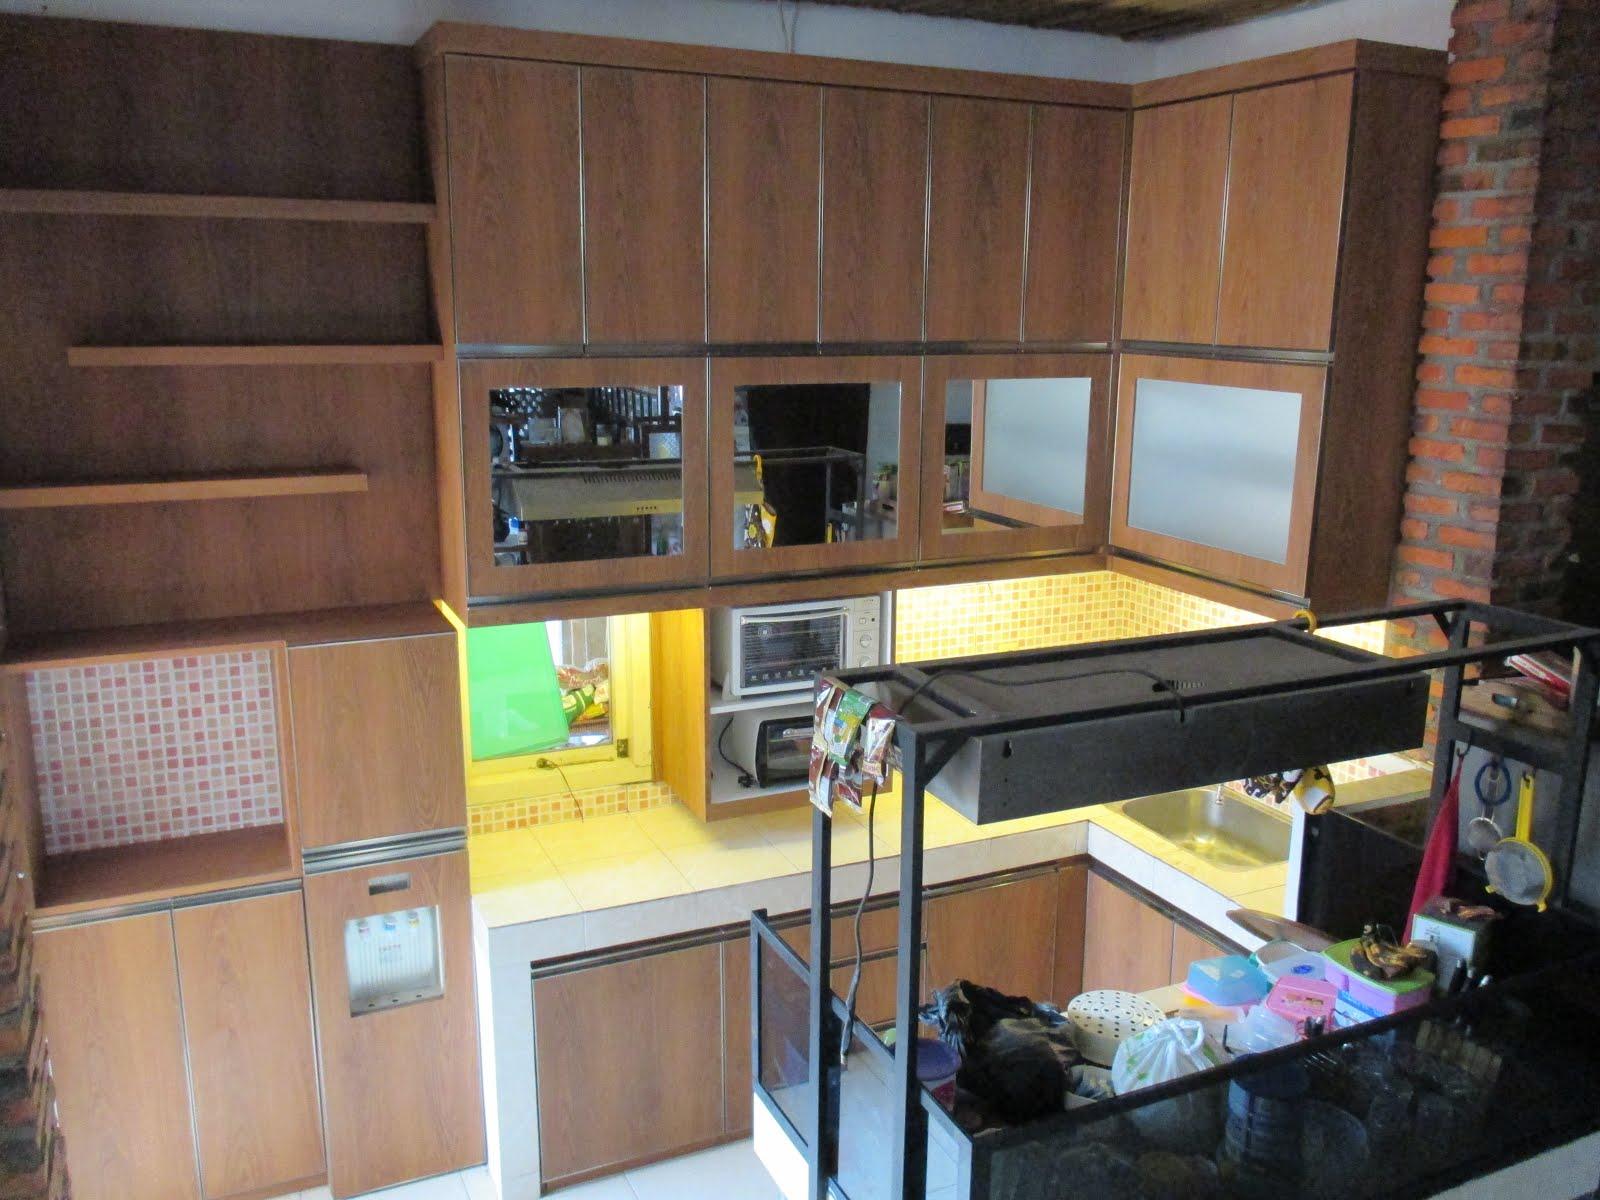 Kitchen set Mas M, Agus aga. Jl Sukun Ciputat